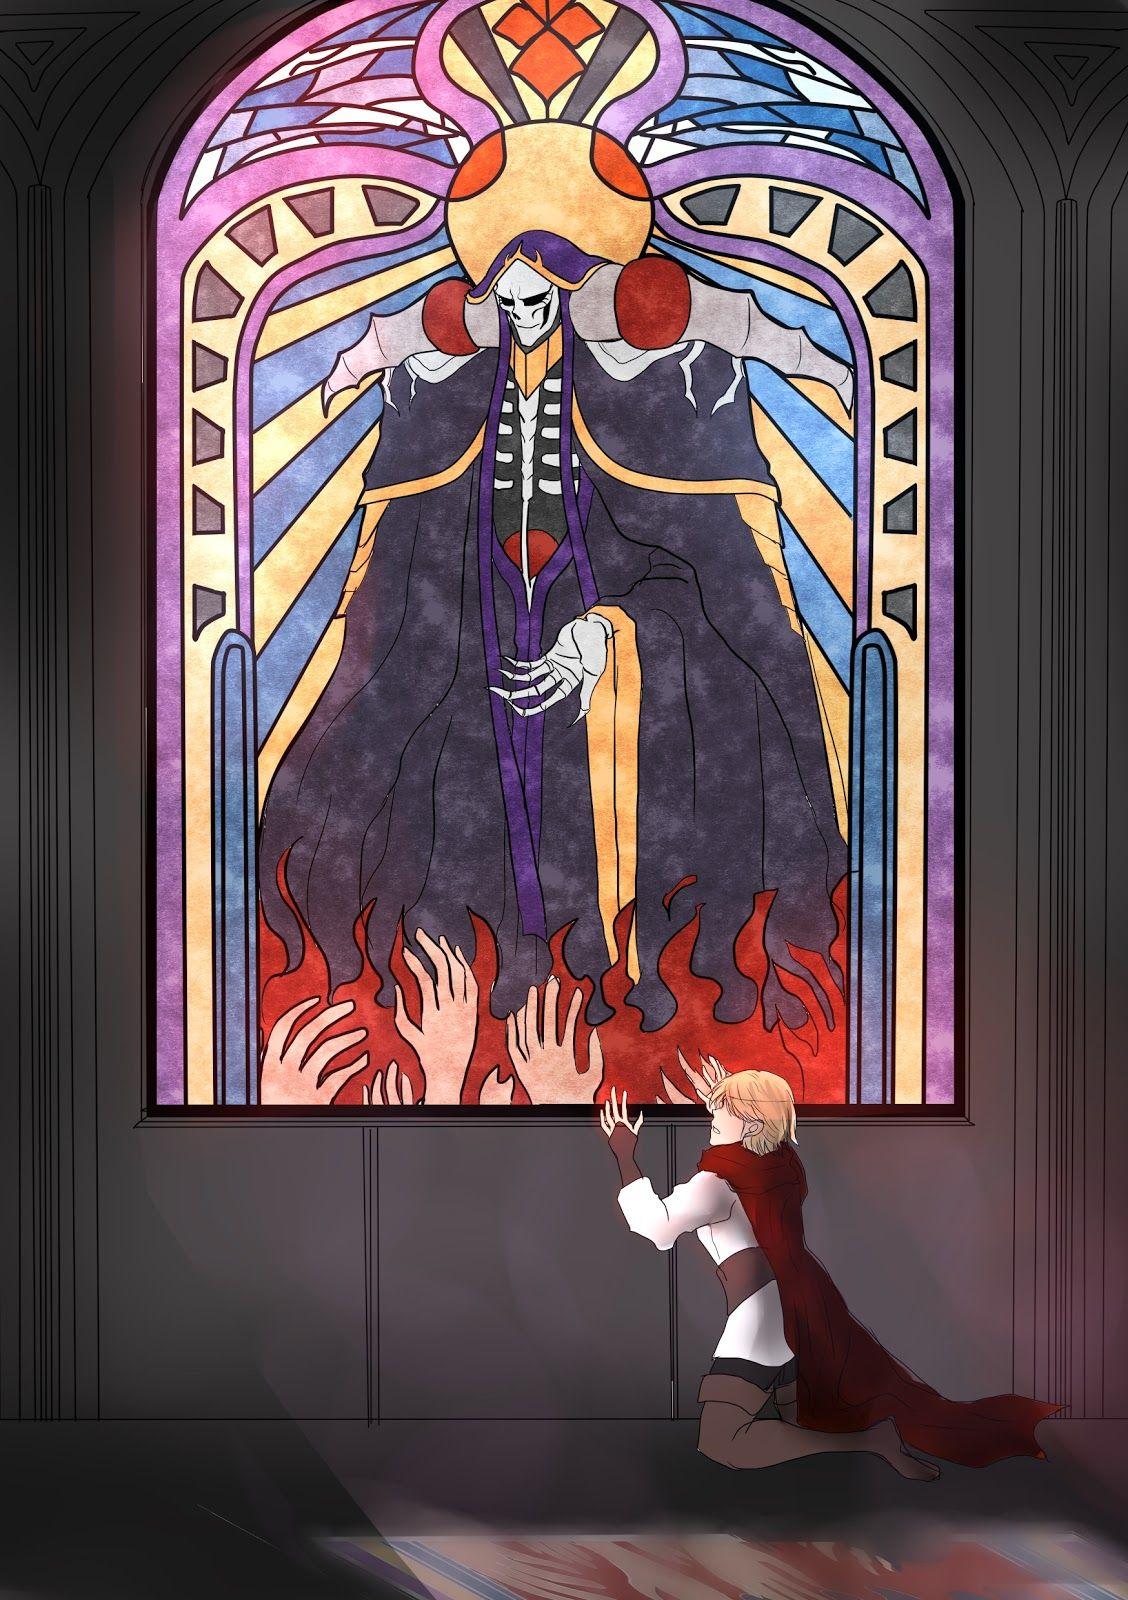 Overlord Volume 10 Where Overlord Anime Anime Anime Wallpaper 10 overlord anime wallpaper